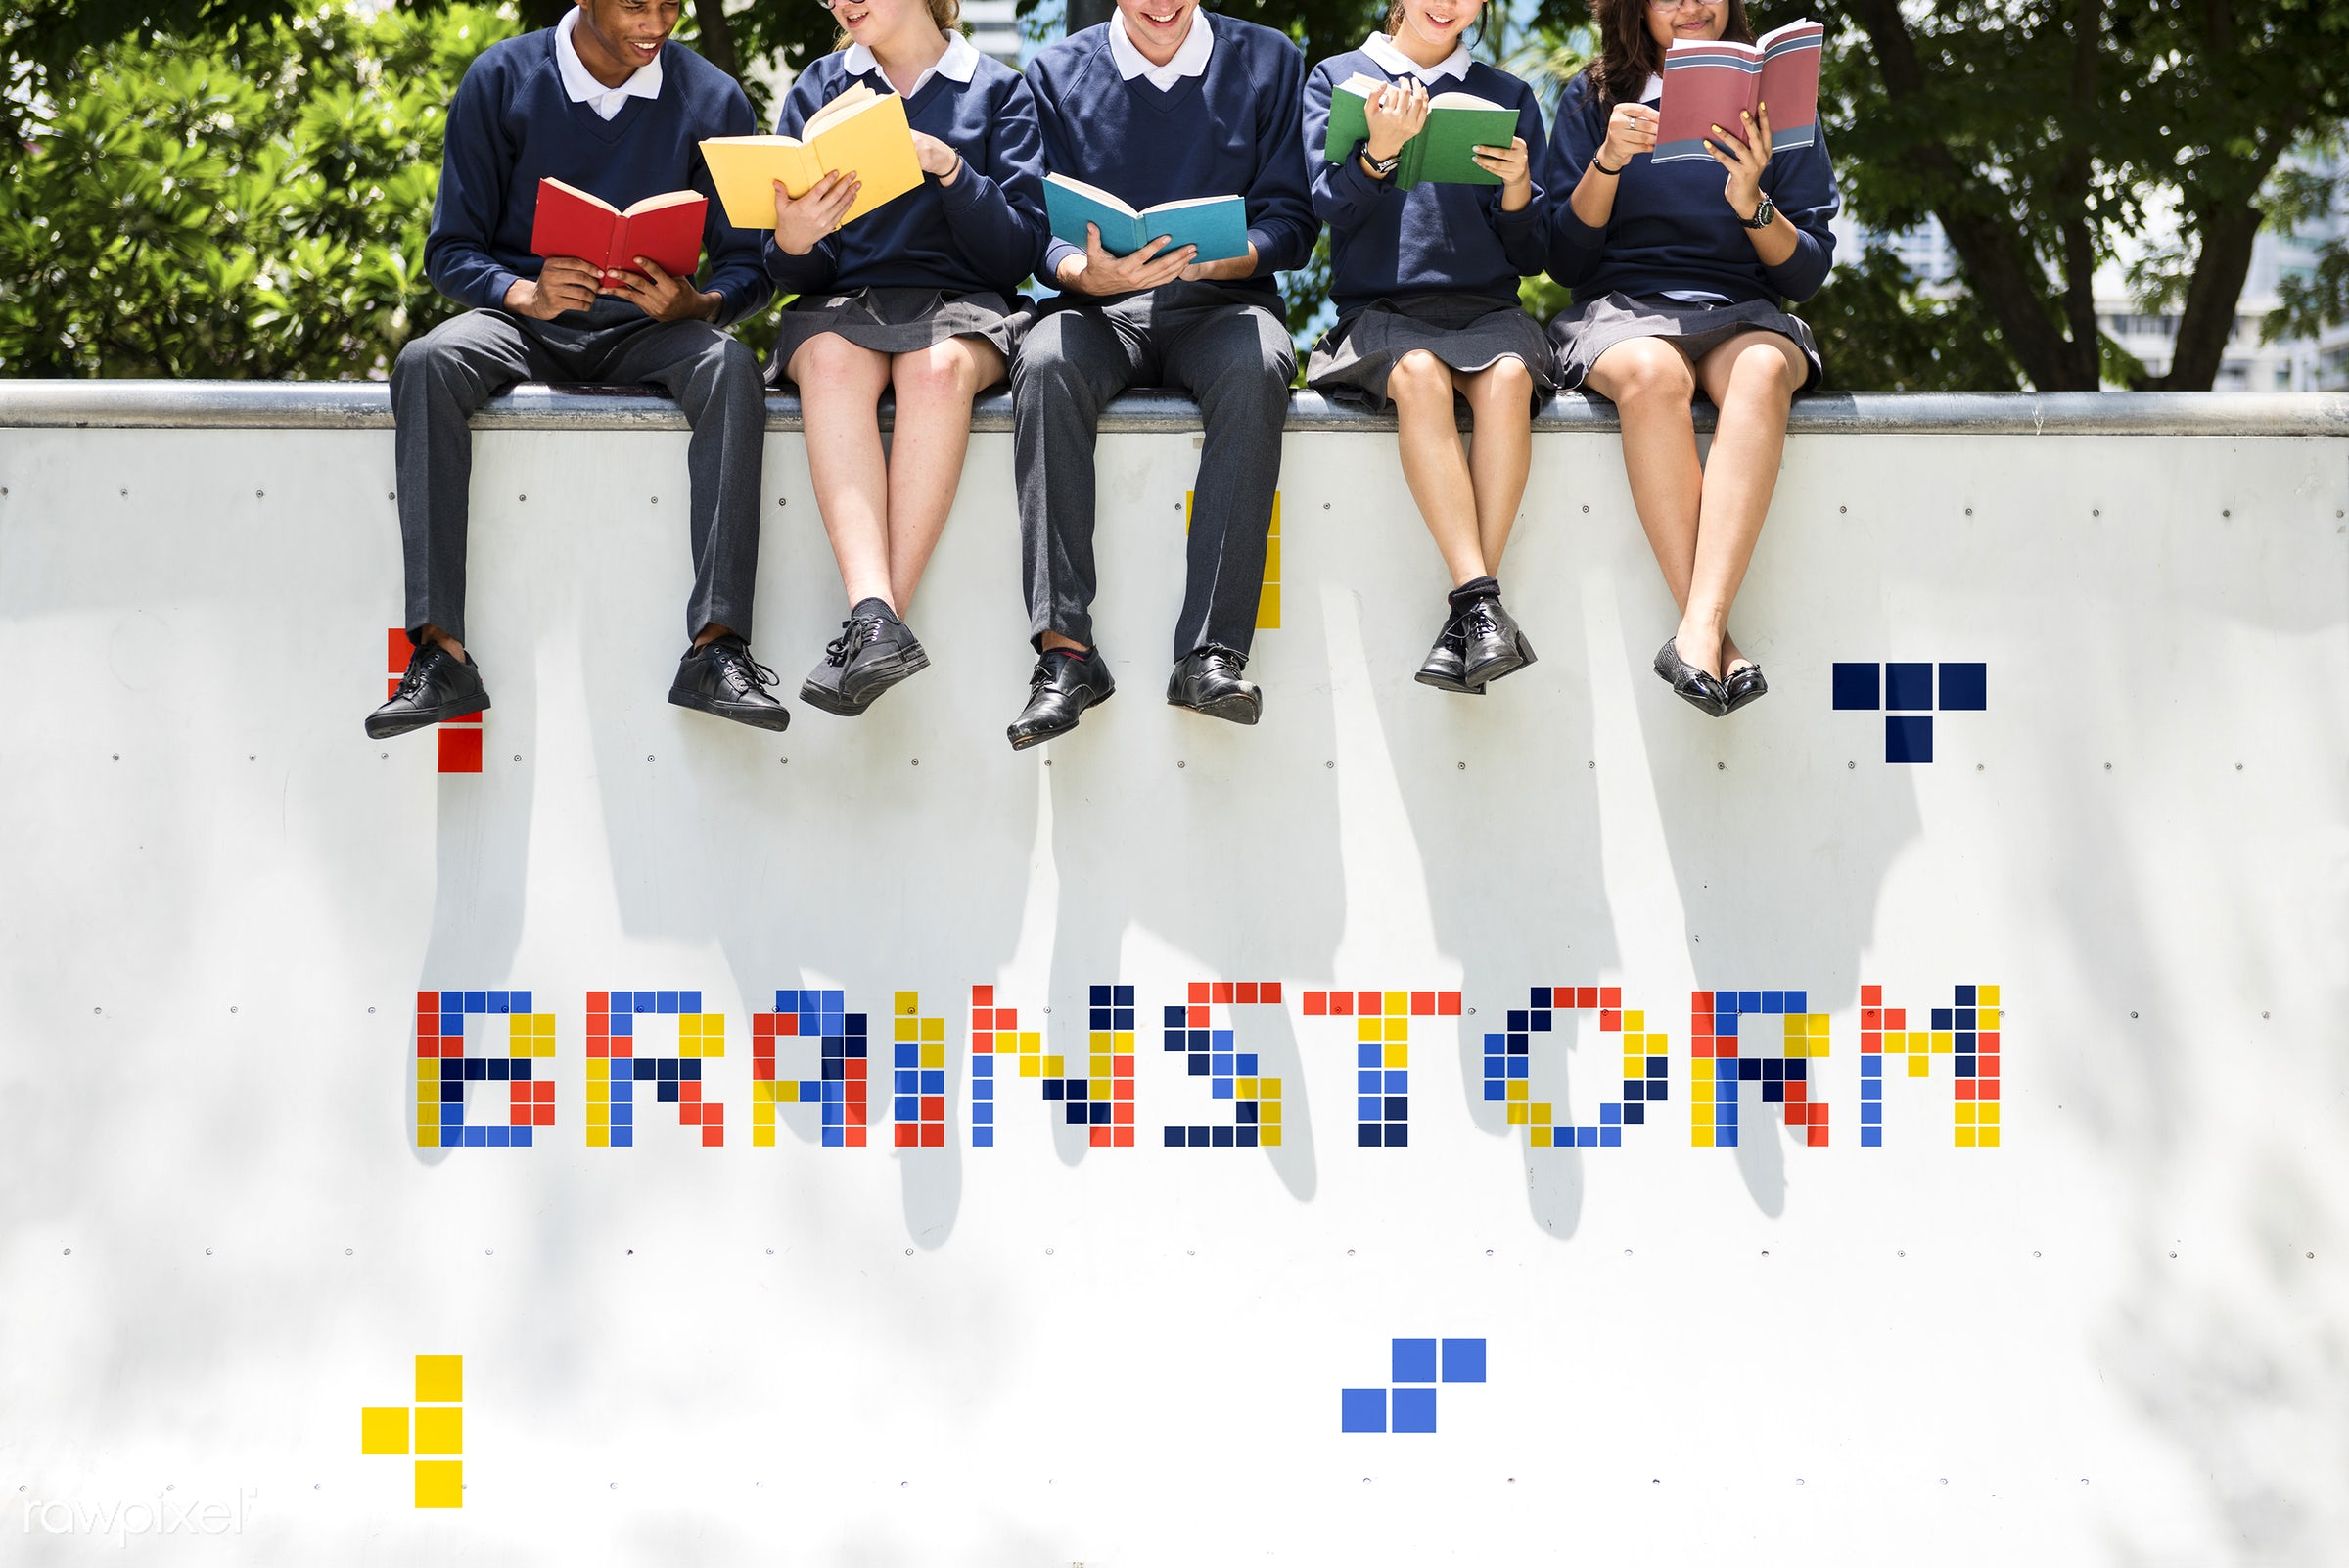 8 bit, block, books, brainstorm, class, college, diversity, friends, friendship, game, graphic, high school, holding,...